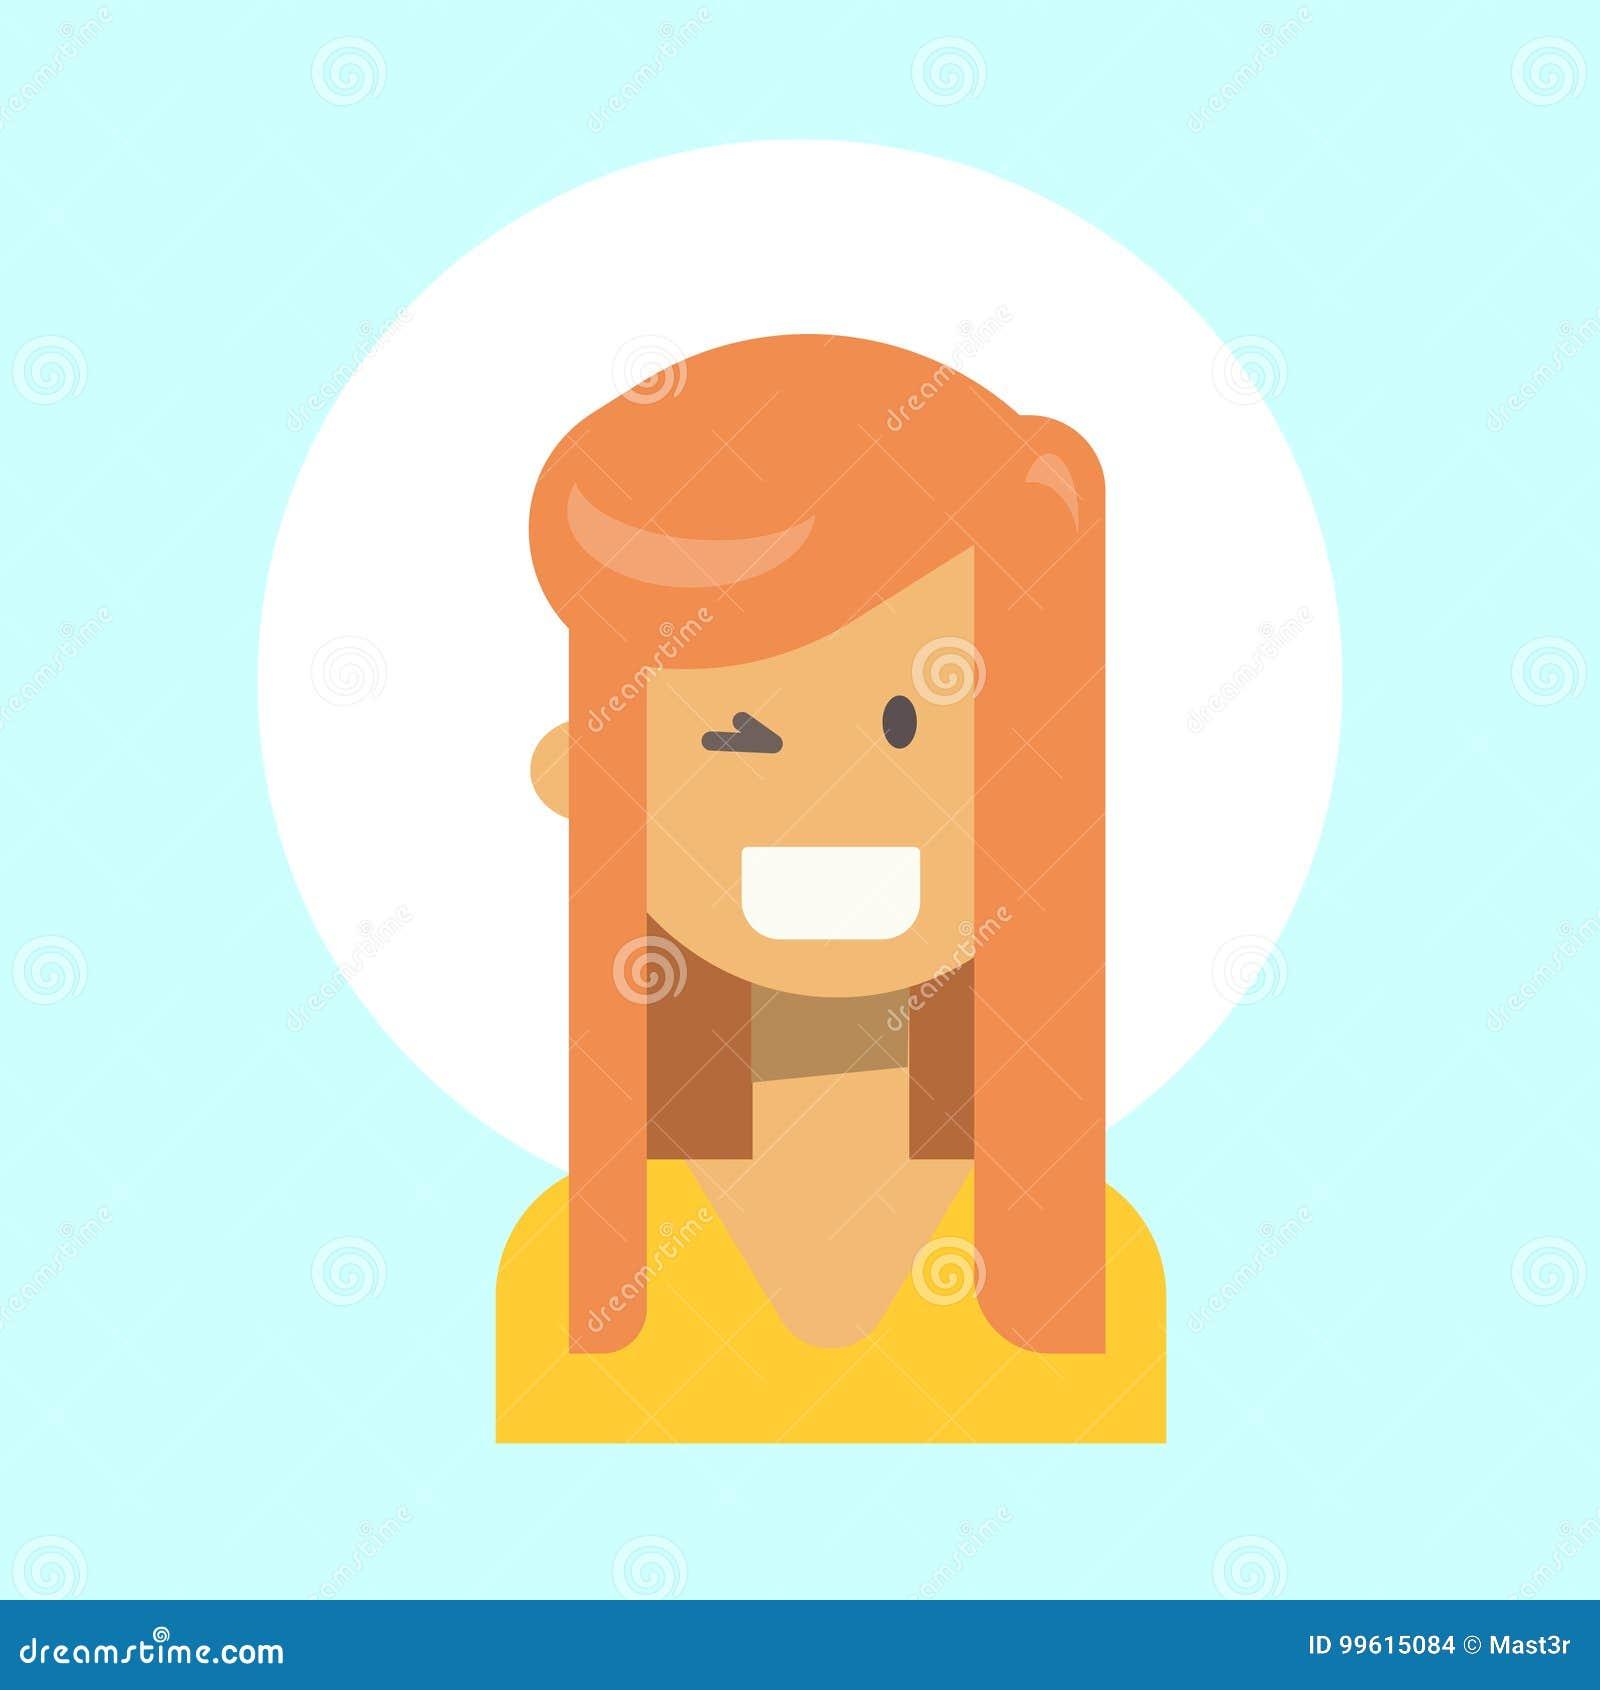 Female Winking Emotion Profile Icon Woman Cartoon Portrait Happy